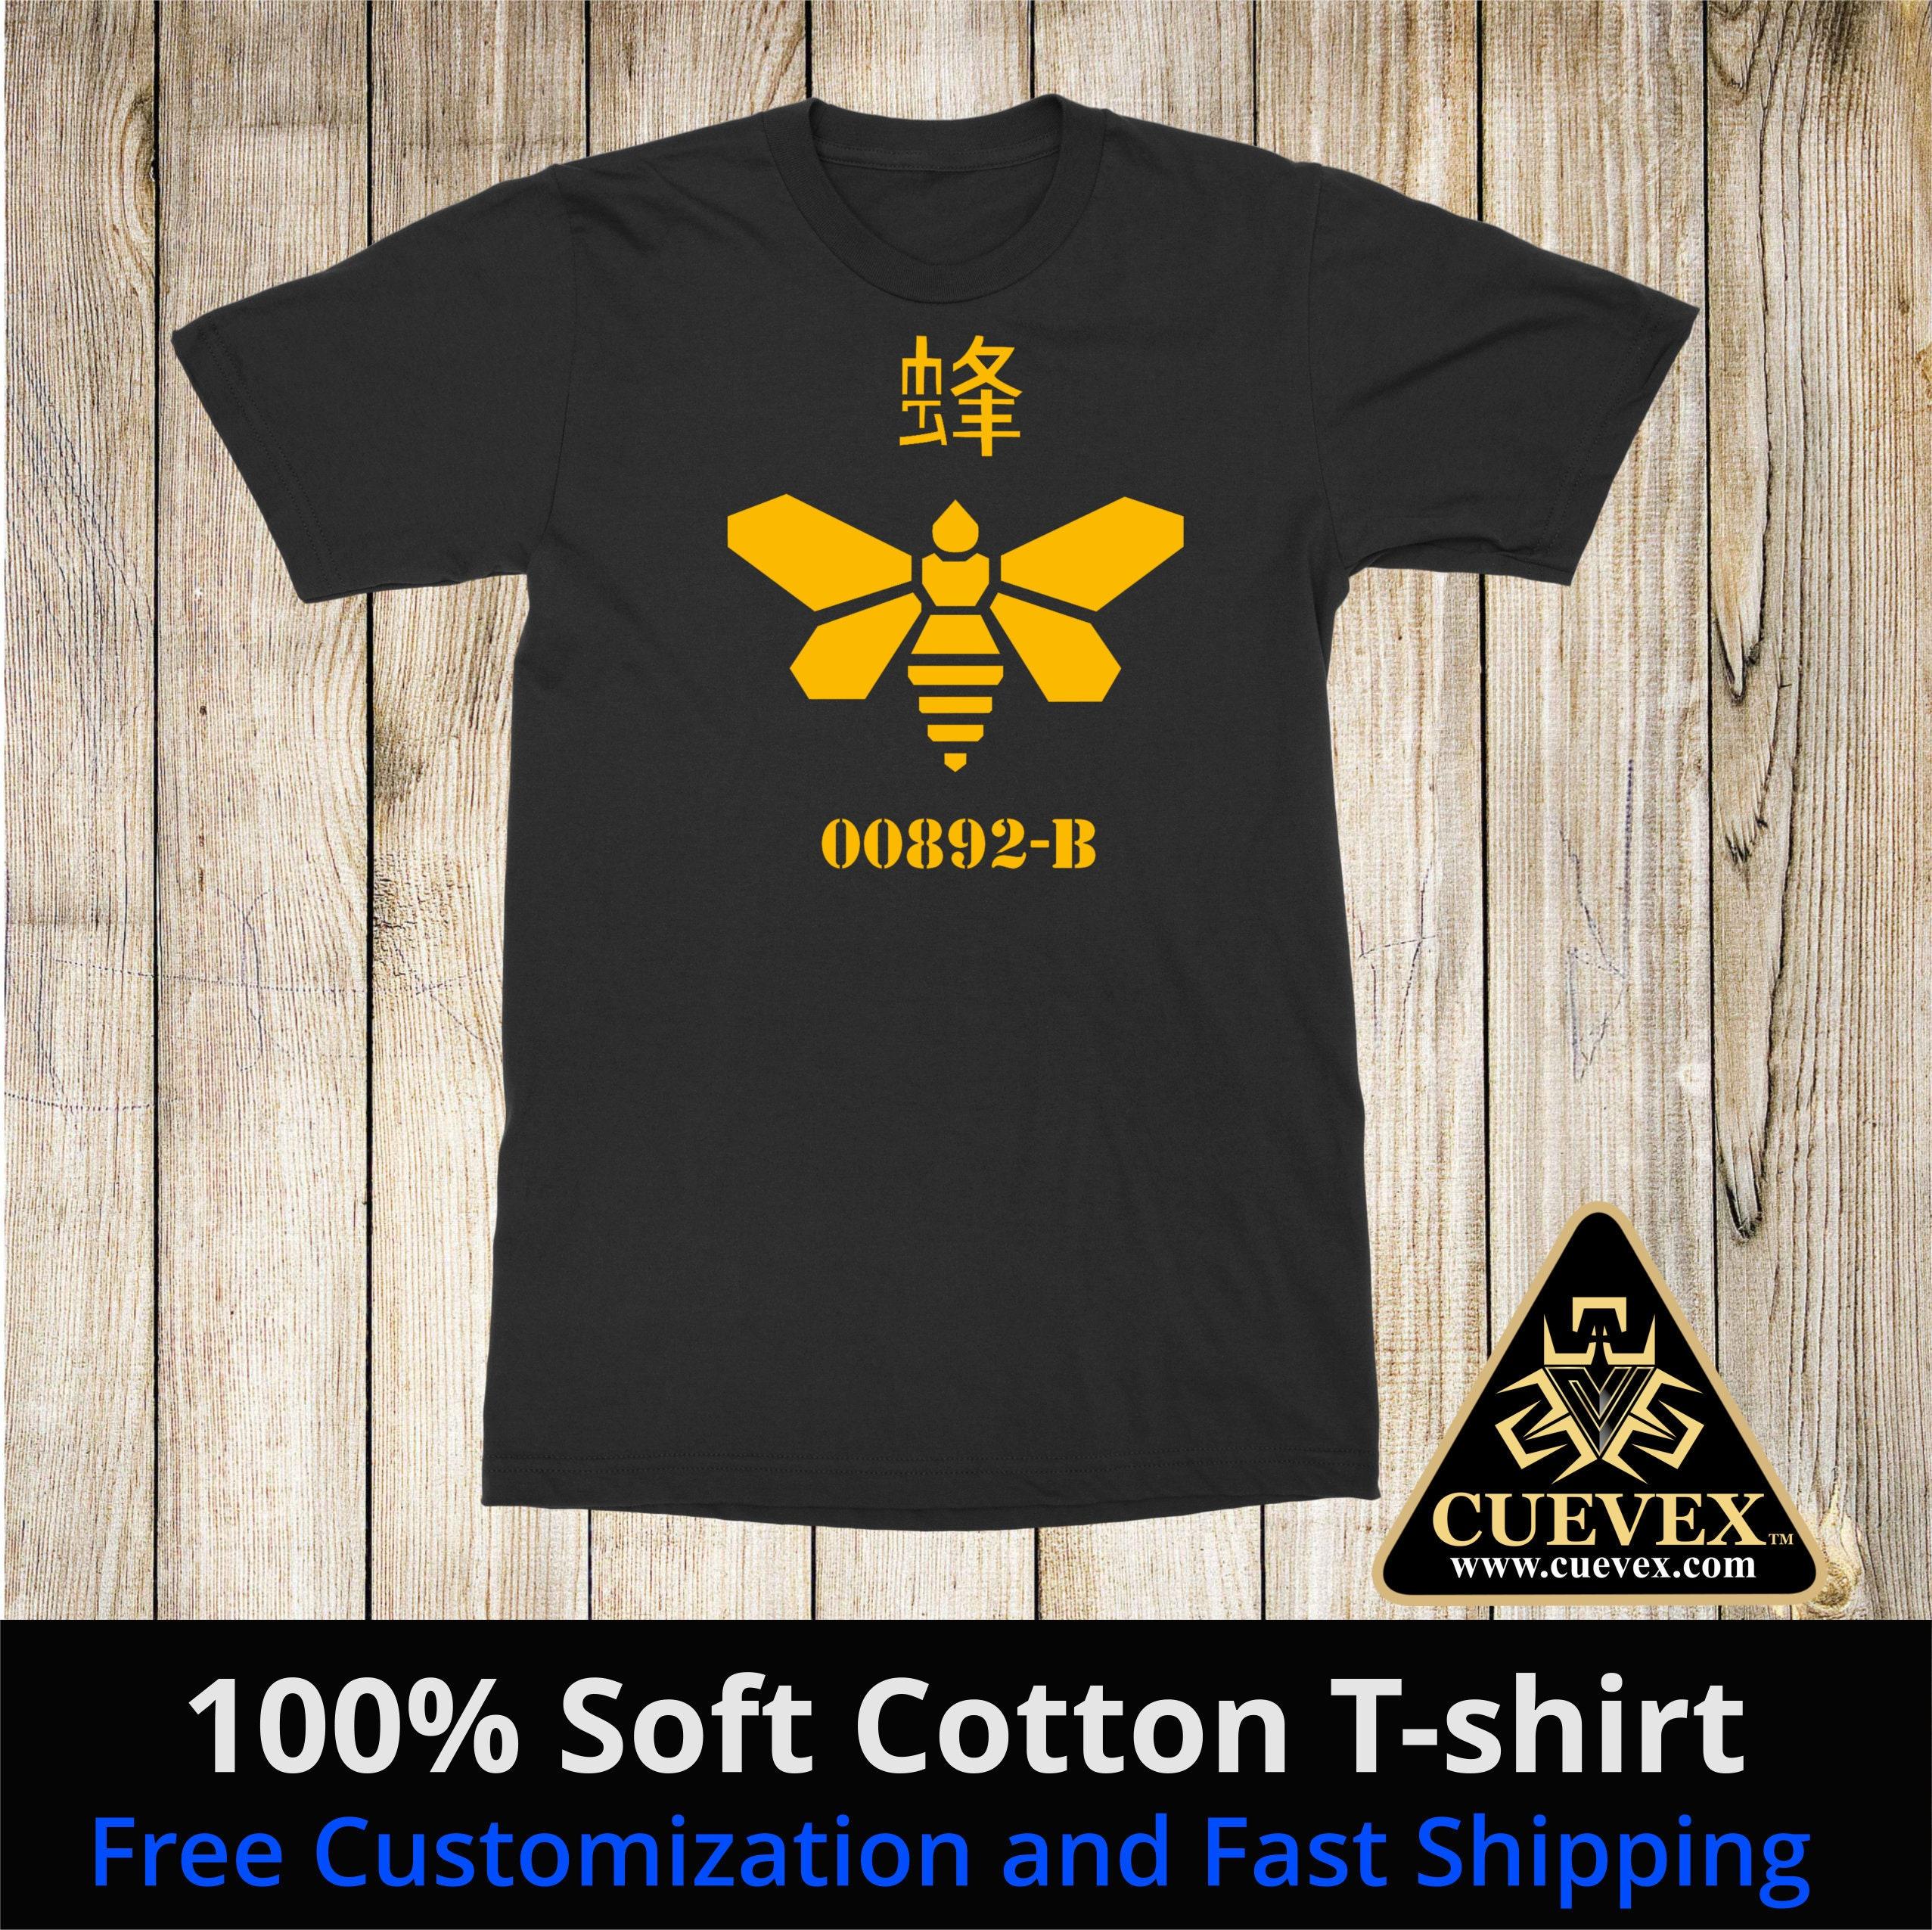 a6f34e360 00892-B Methylamine Bee Barrel Heisenberg Unisex Shirt   Etsy